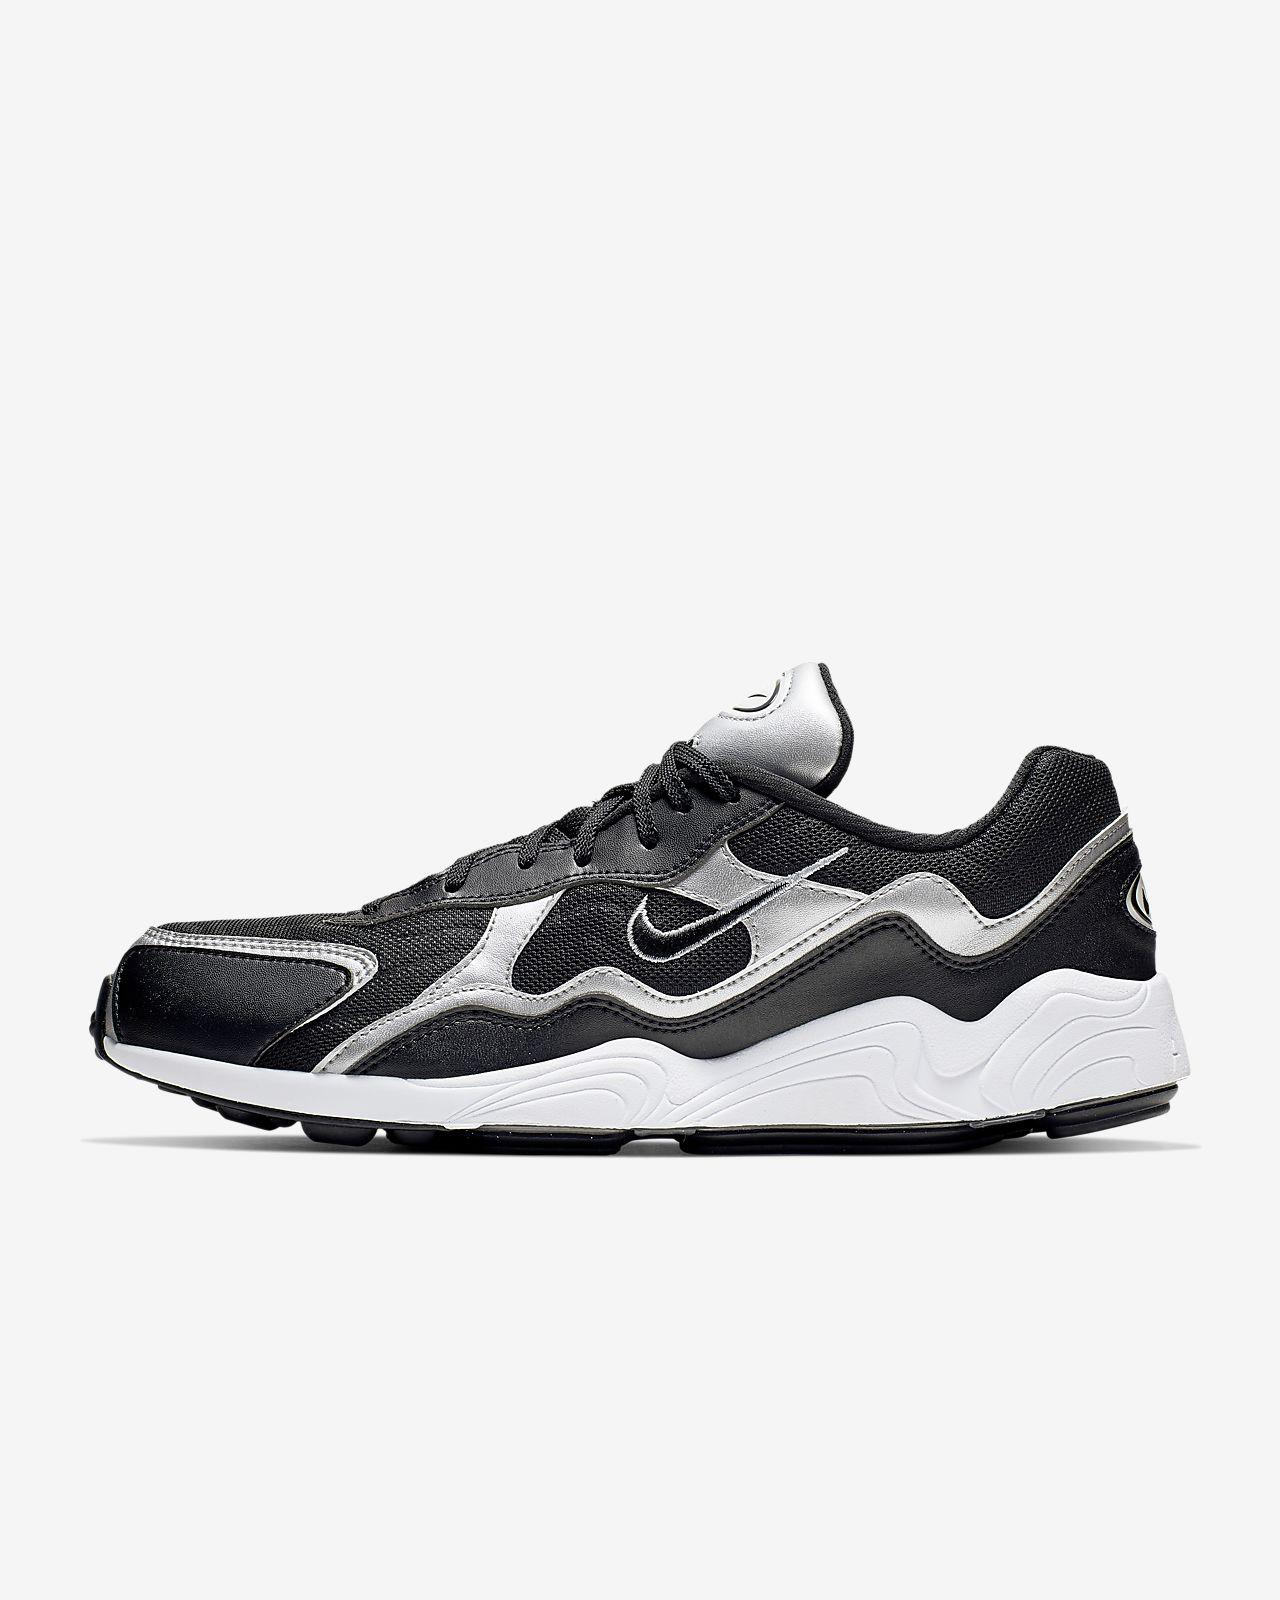 NikeAir Zoom Alpha男子运动鞋